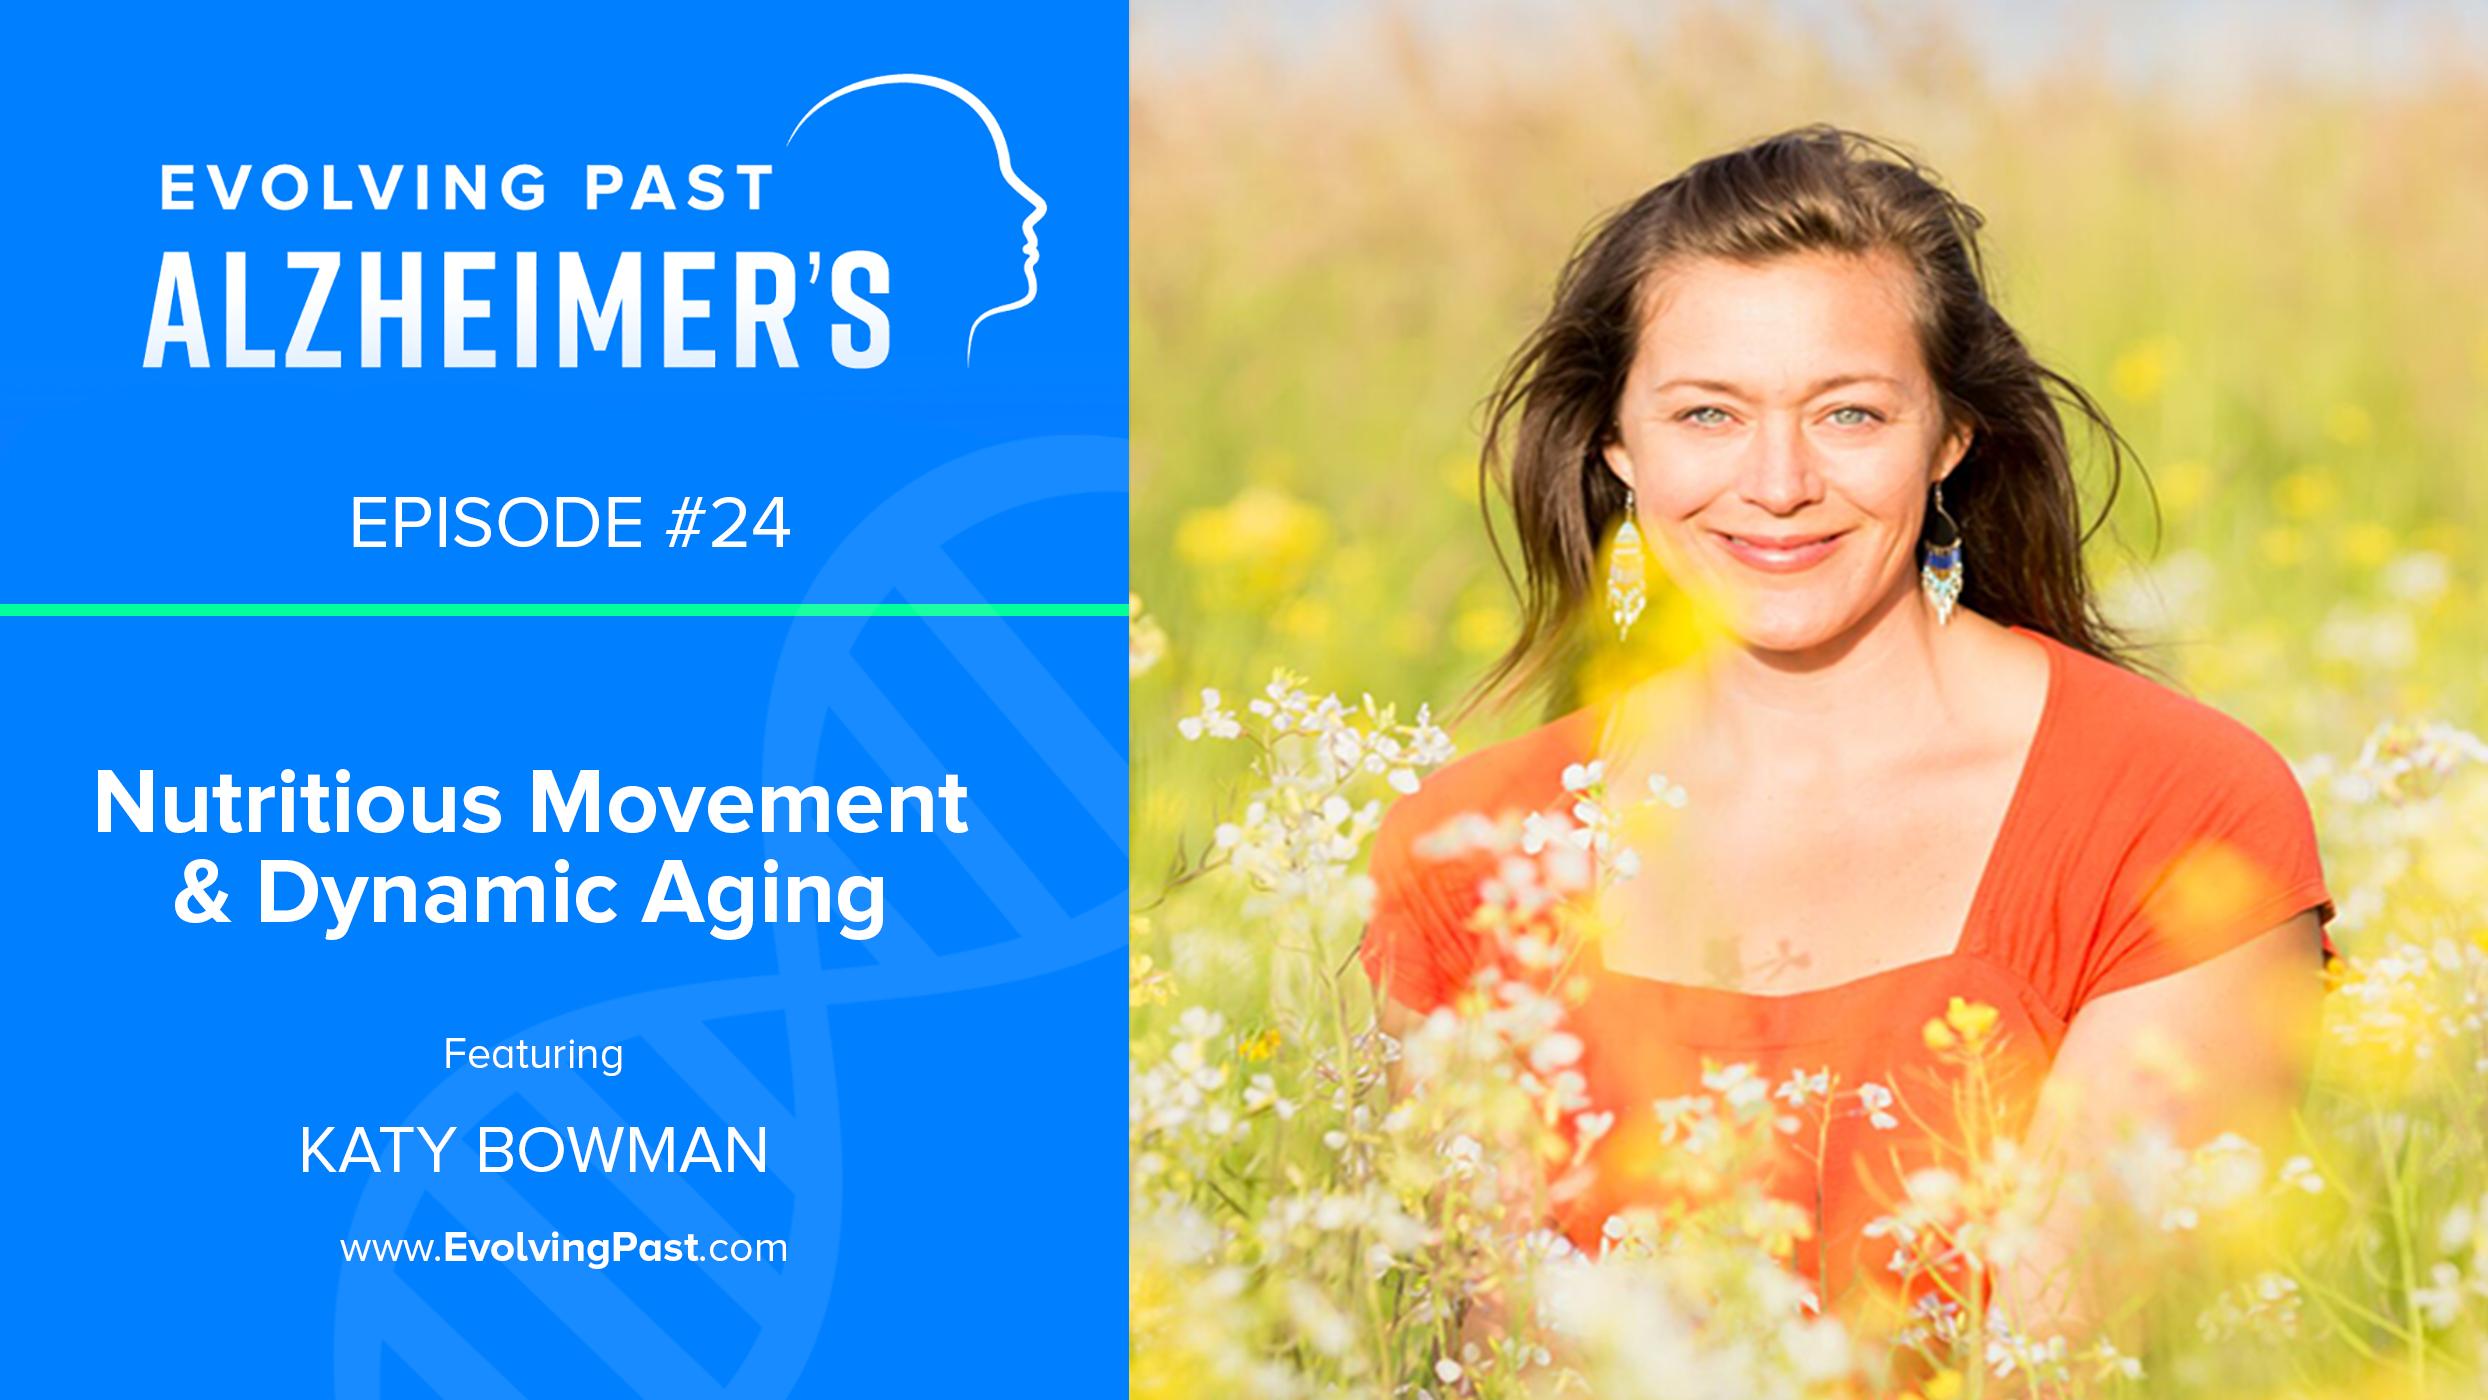 Evolving Past Alzheimer's - Episode 24 Katy Bowman